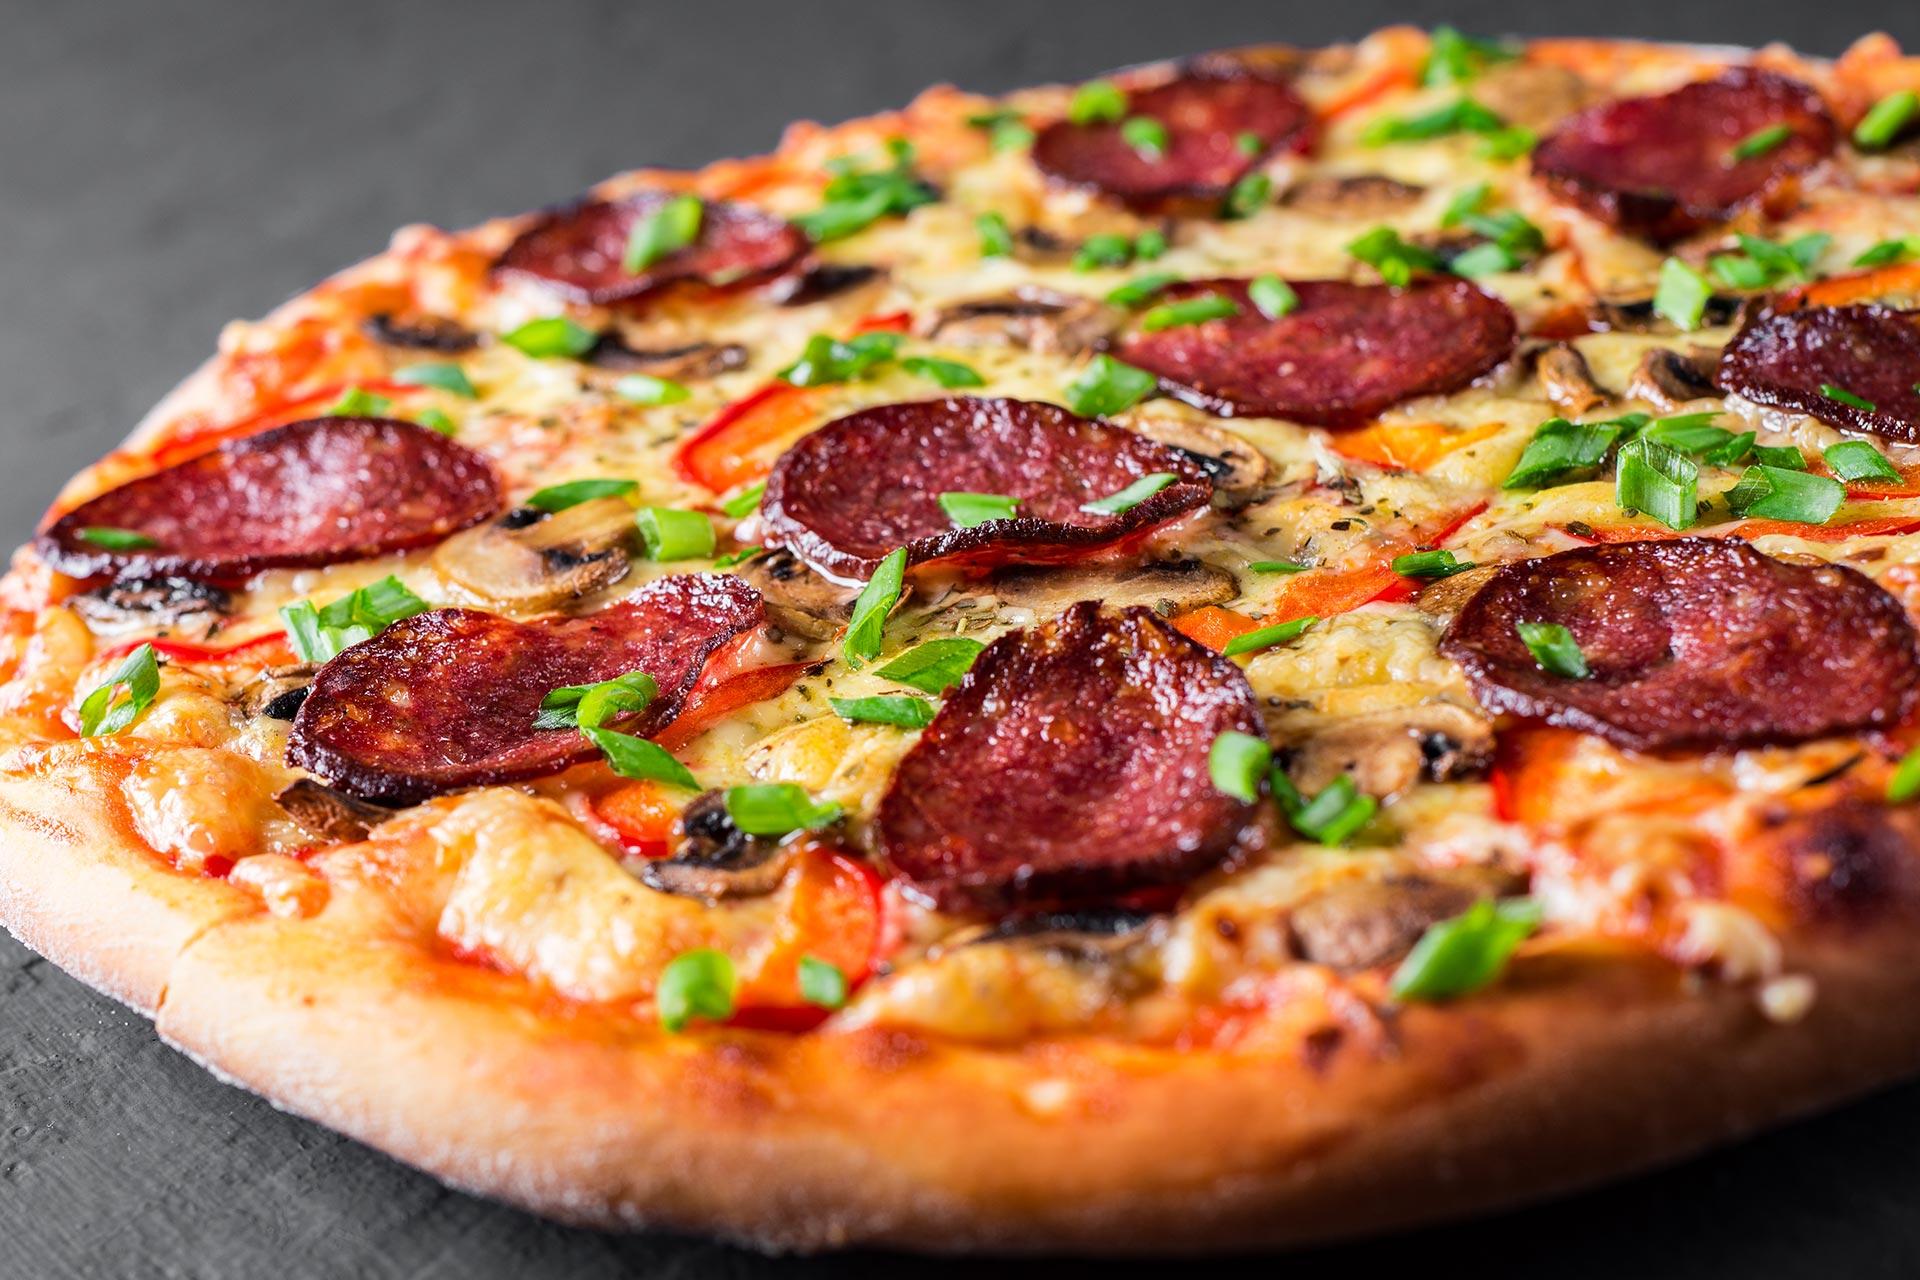 Skylark Rooftop Bar and Pizza Restaurant in London